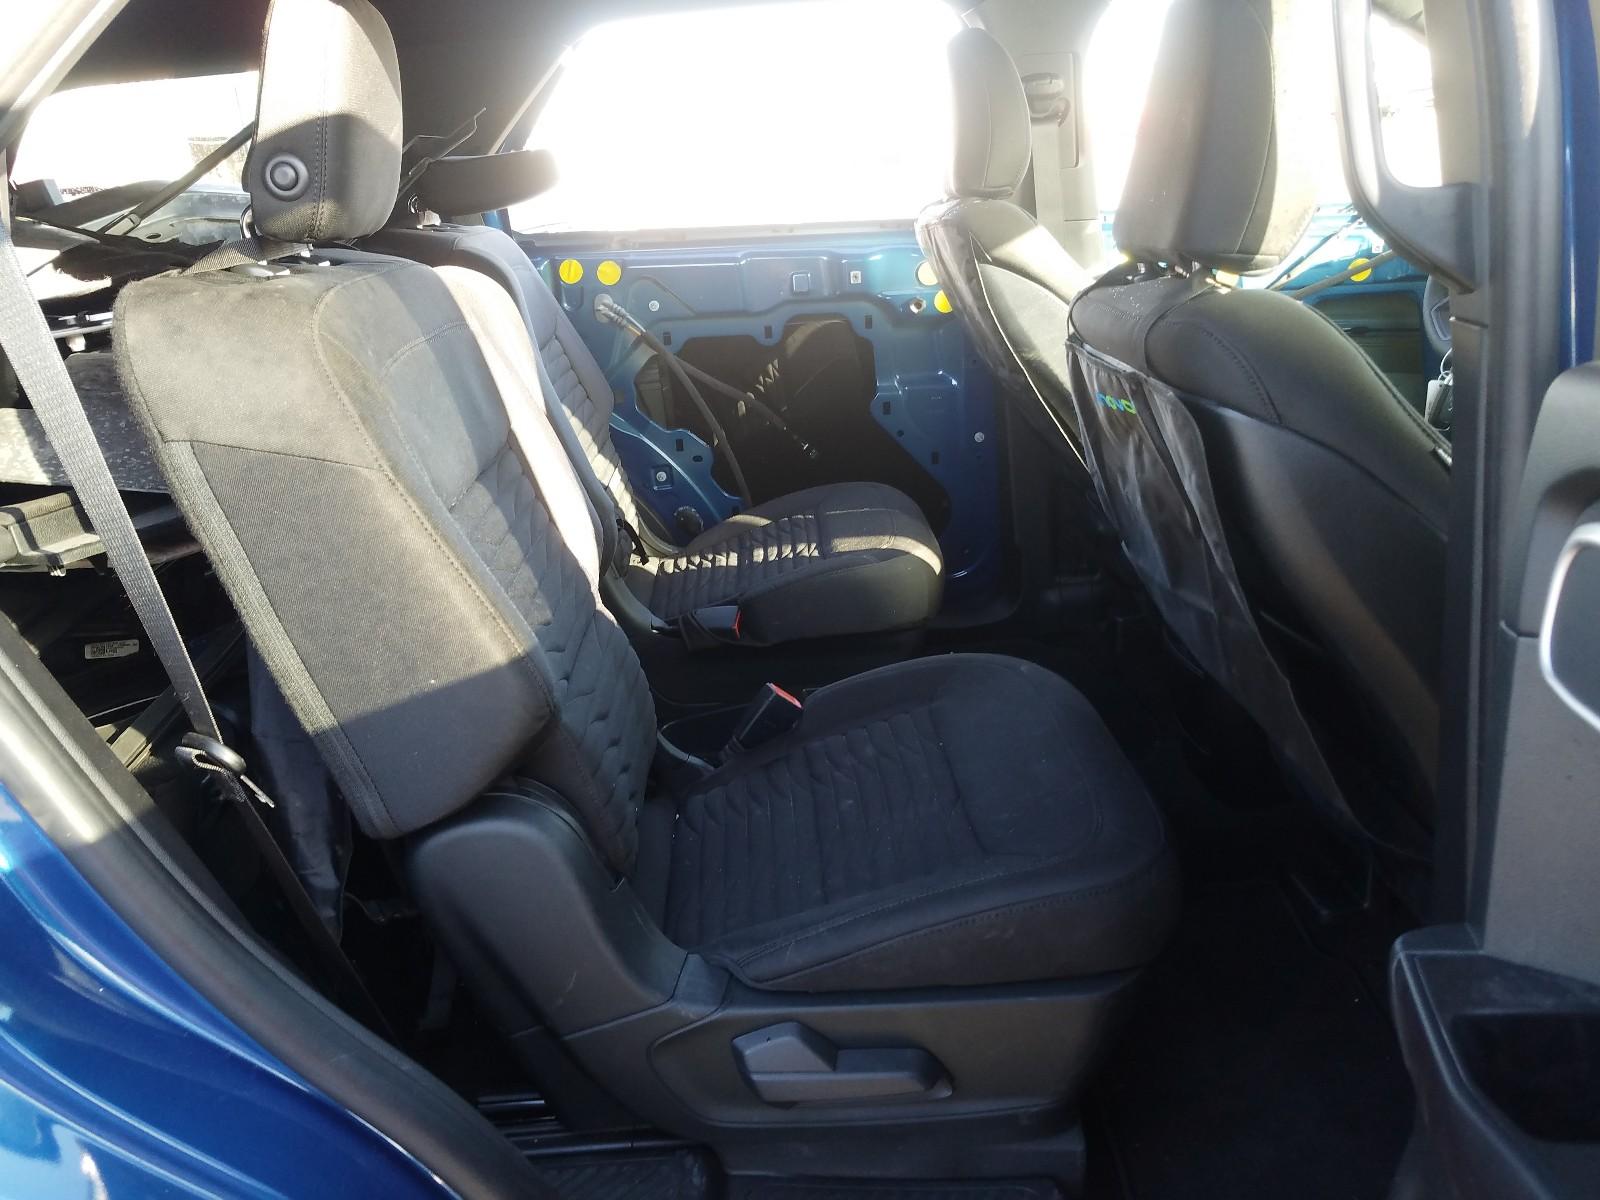 1FMSK7DH1LGB15824 - 2020 Ford Explorer X 2.3L detail view